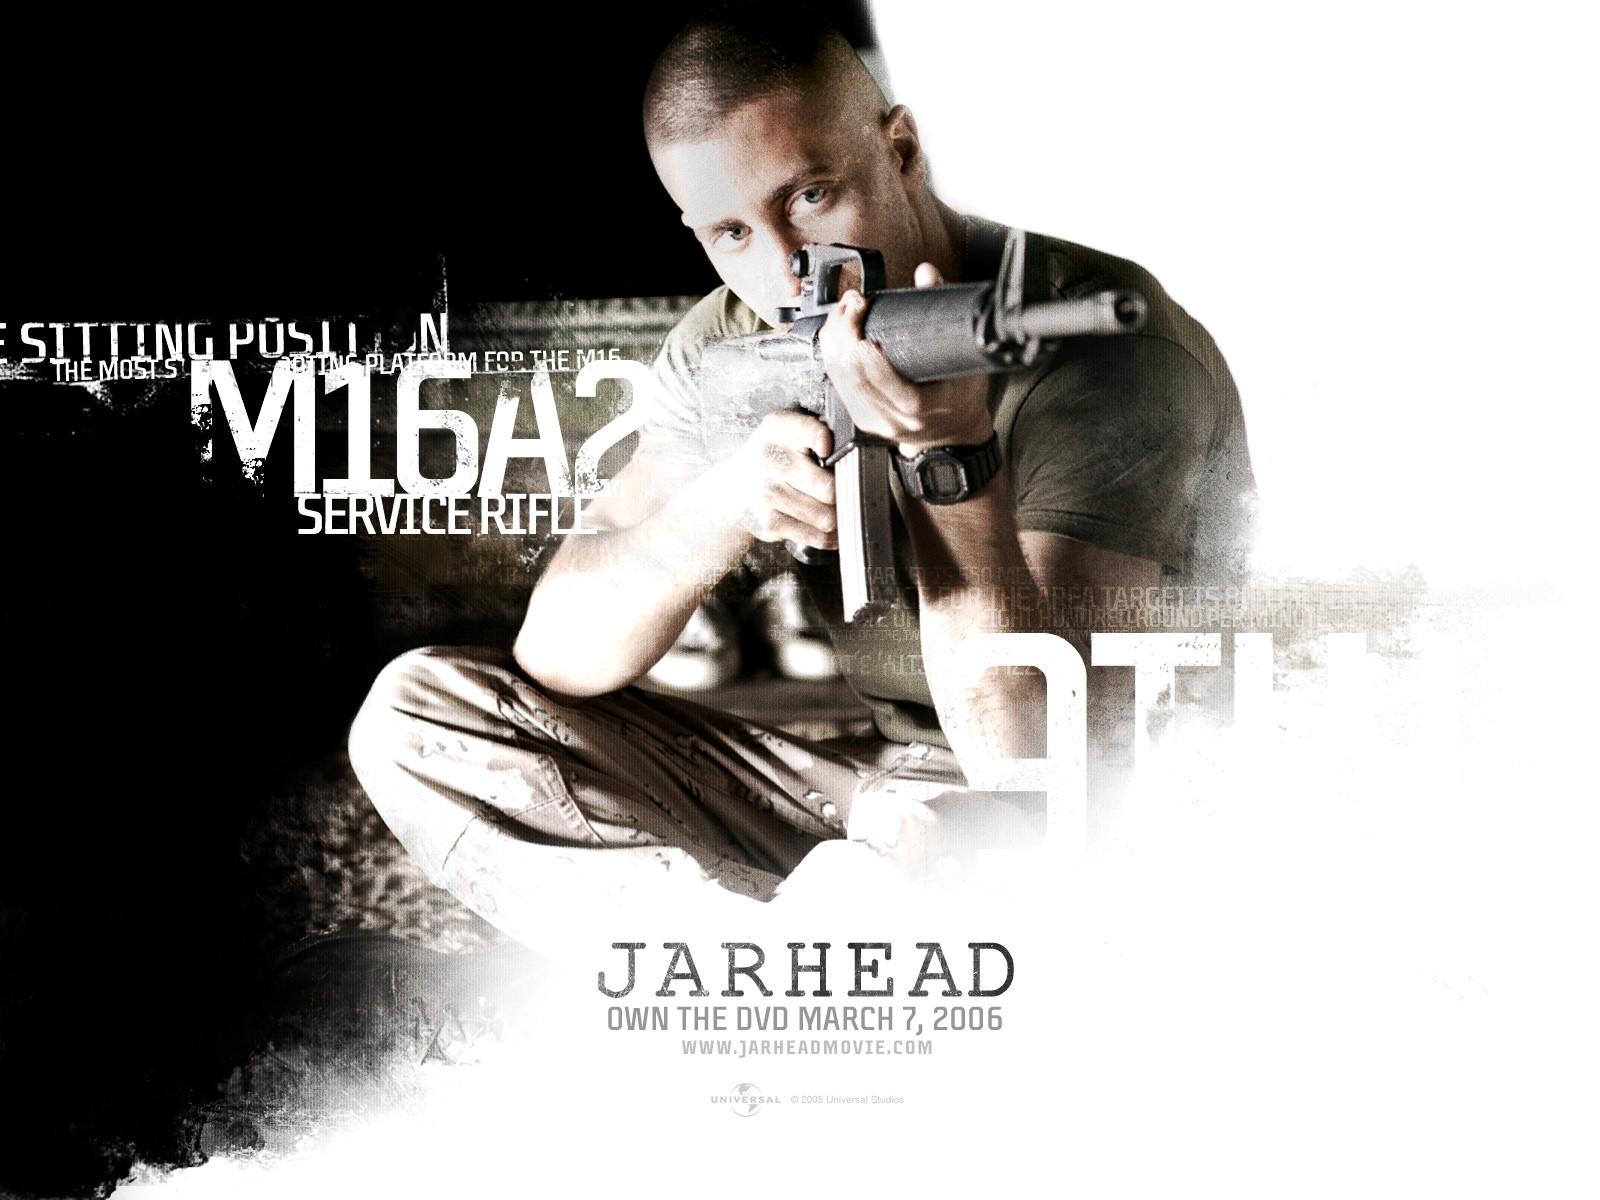 Wallpaper di Jake Gyllehaal nel film Jarhead